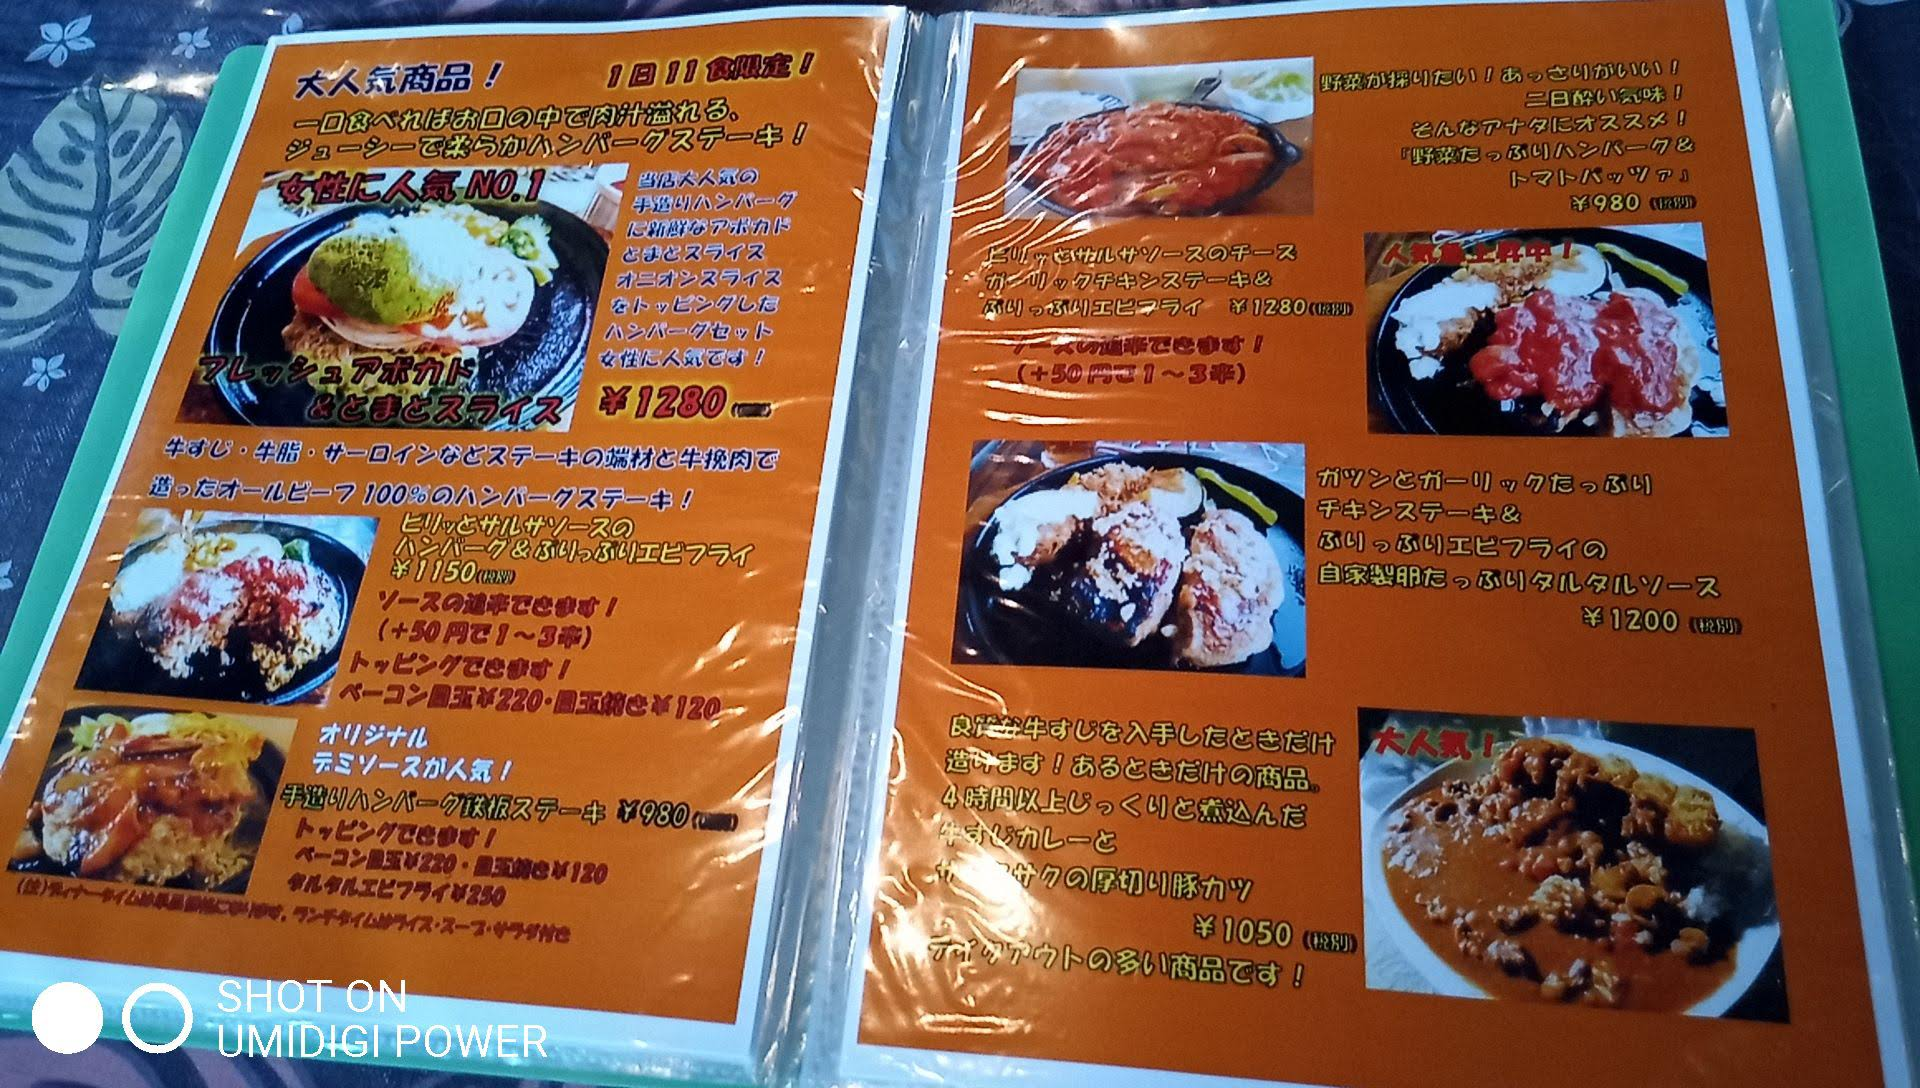 the menu of Meat Bar Hikiy's 4